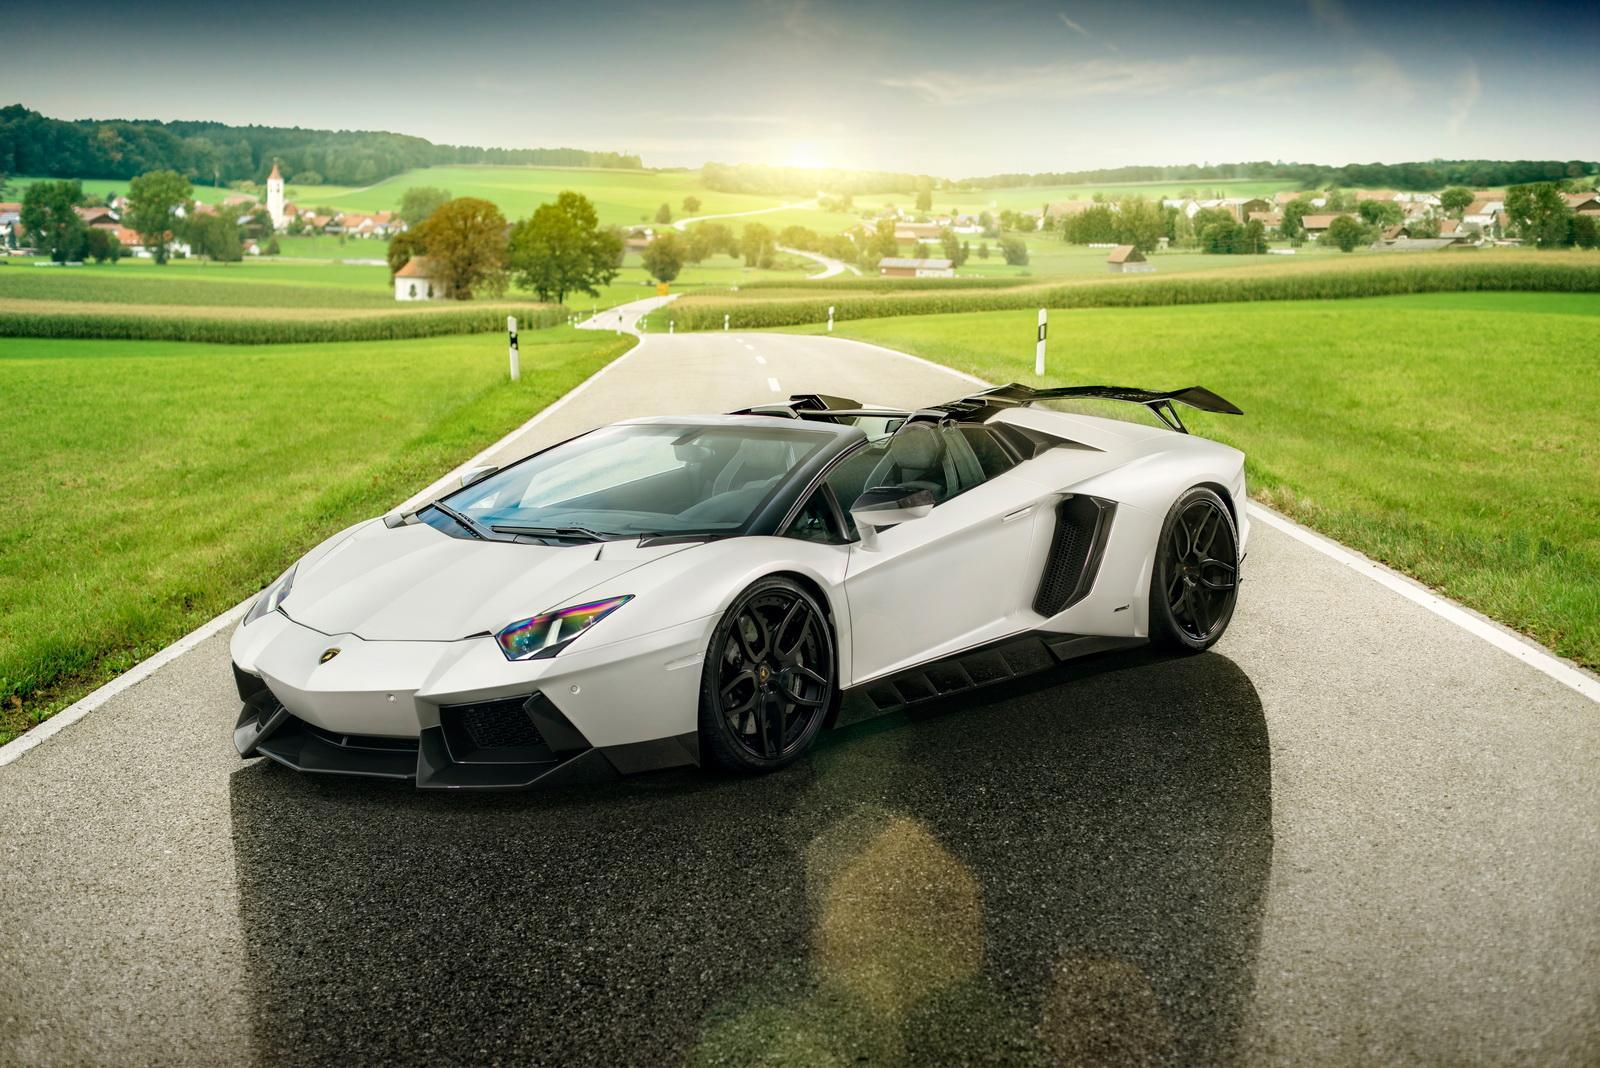 Lamborghini Novitec Torado Backgrounds, Compatible - PC, Mobile, Gadgets| 1600x1068 px